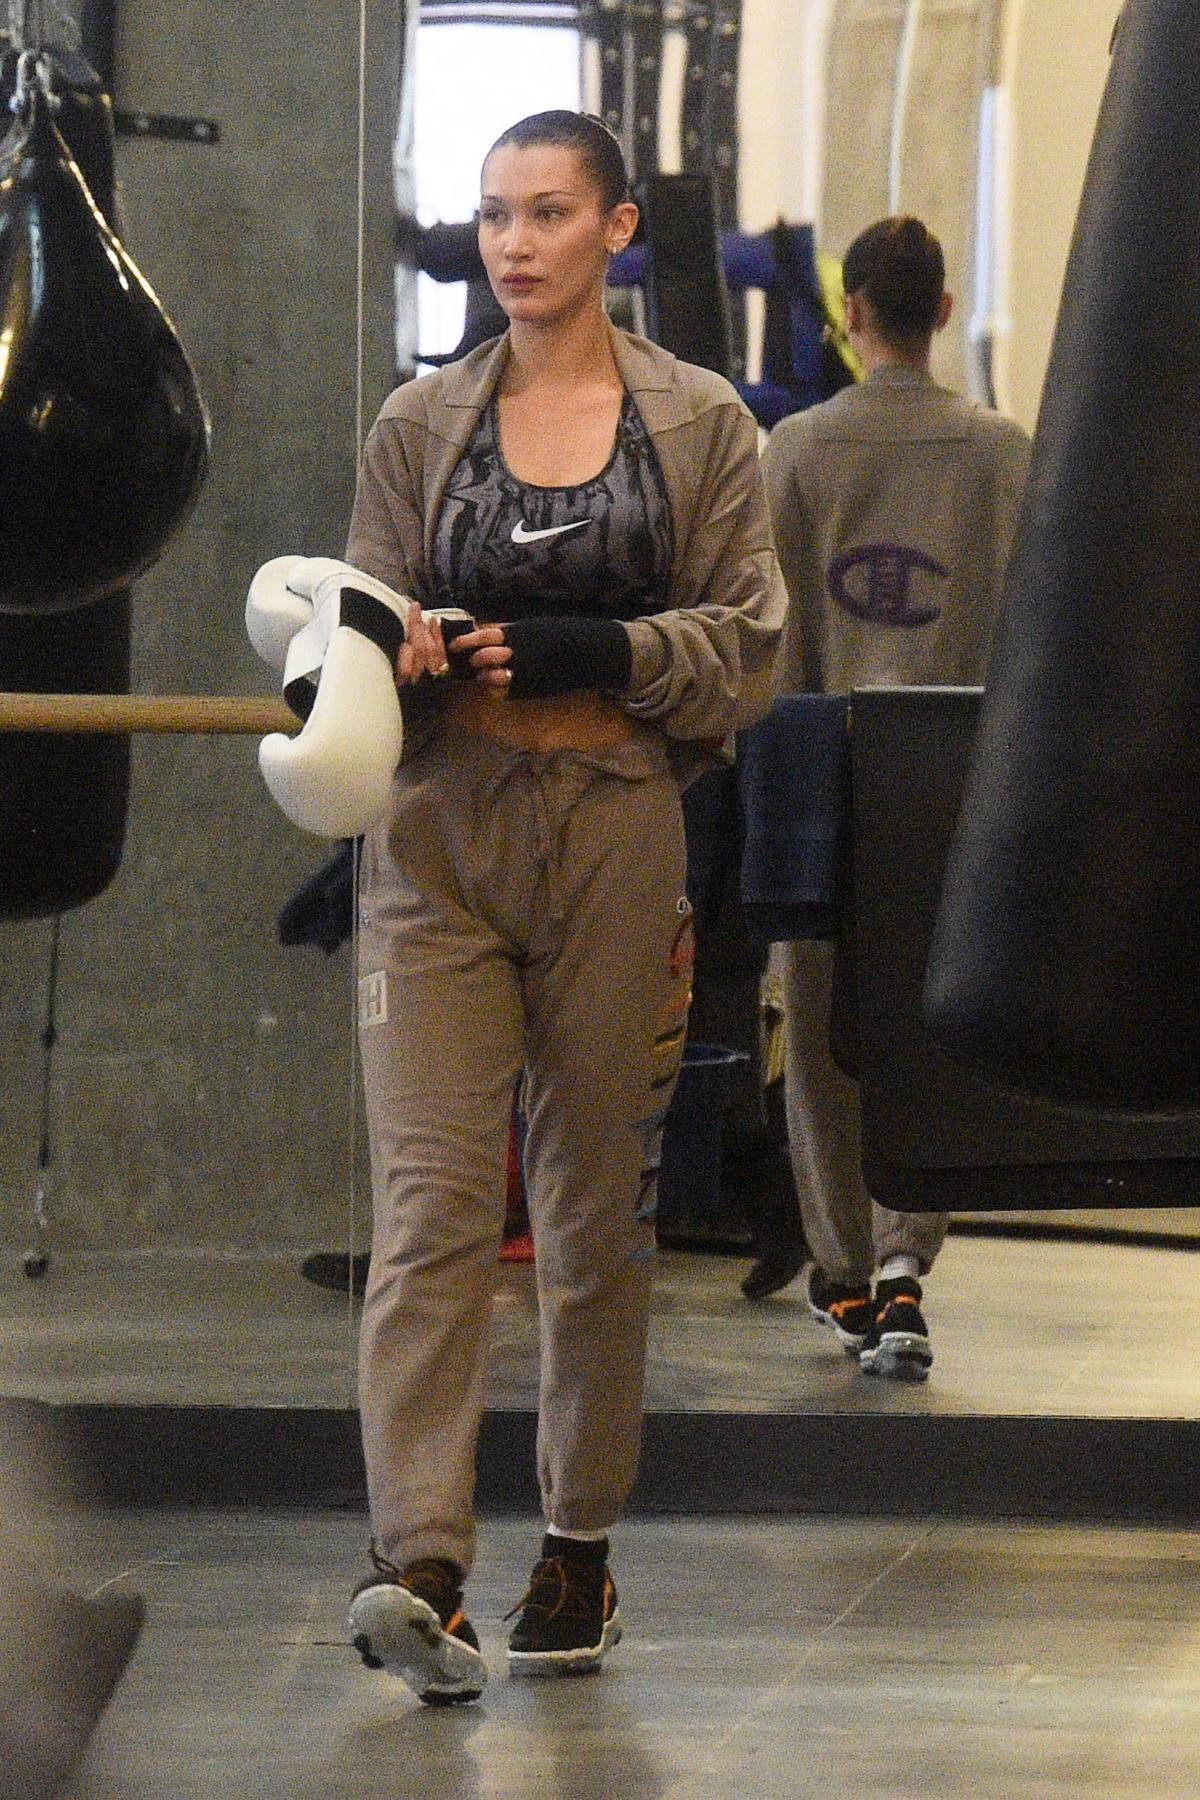 96c3463cf8a8 Bella Hadid wearing Nike Classic Printed Dri-Fit Sports Bra in Gunsmoke